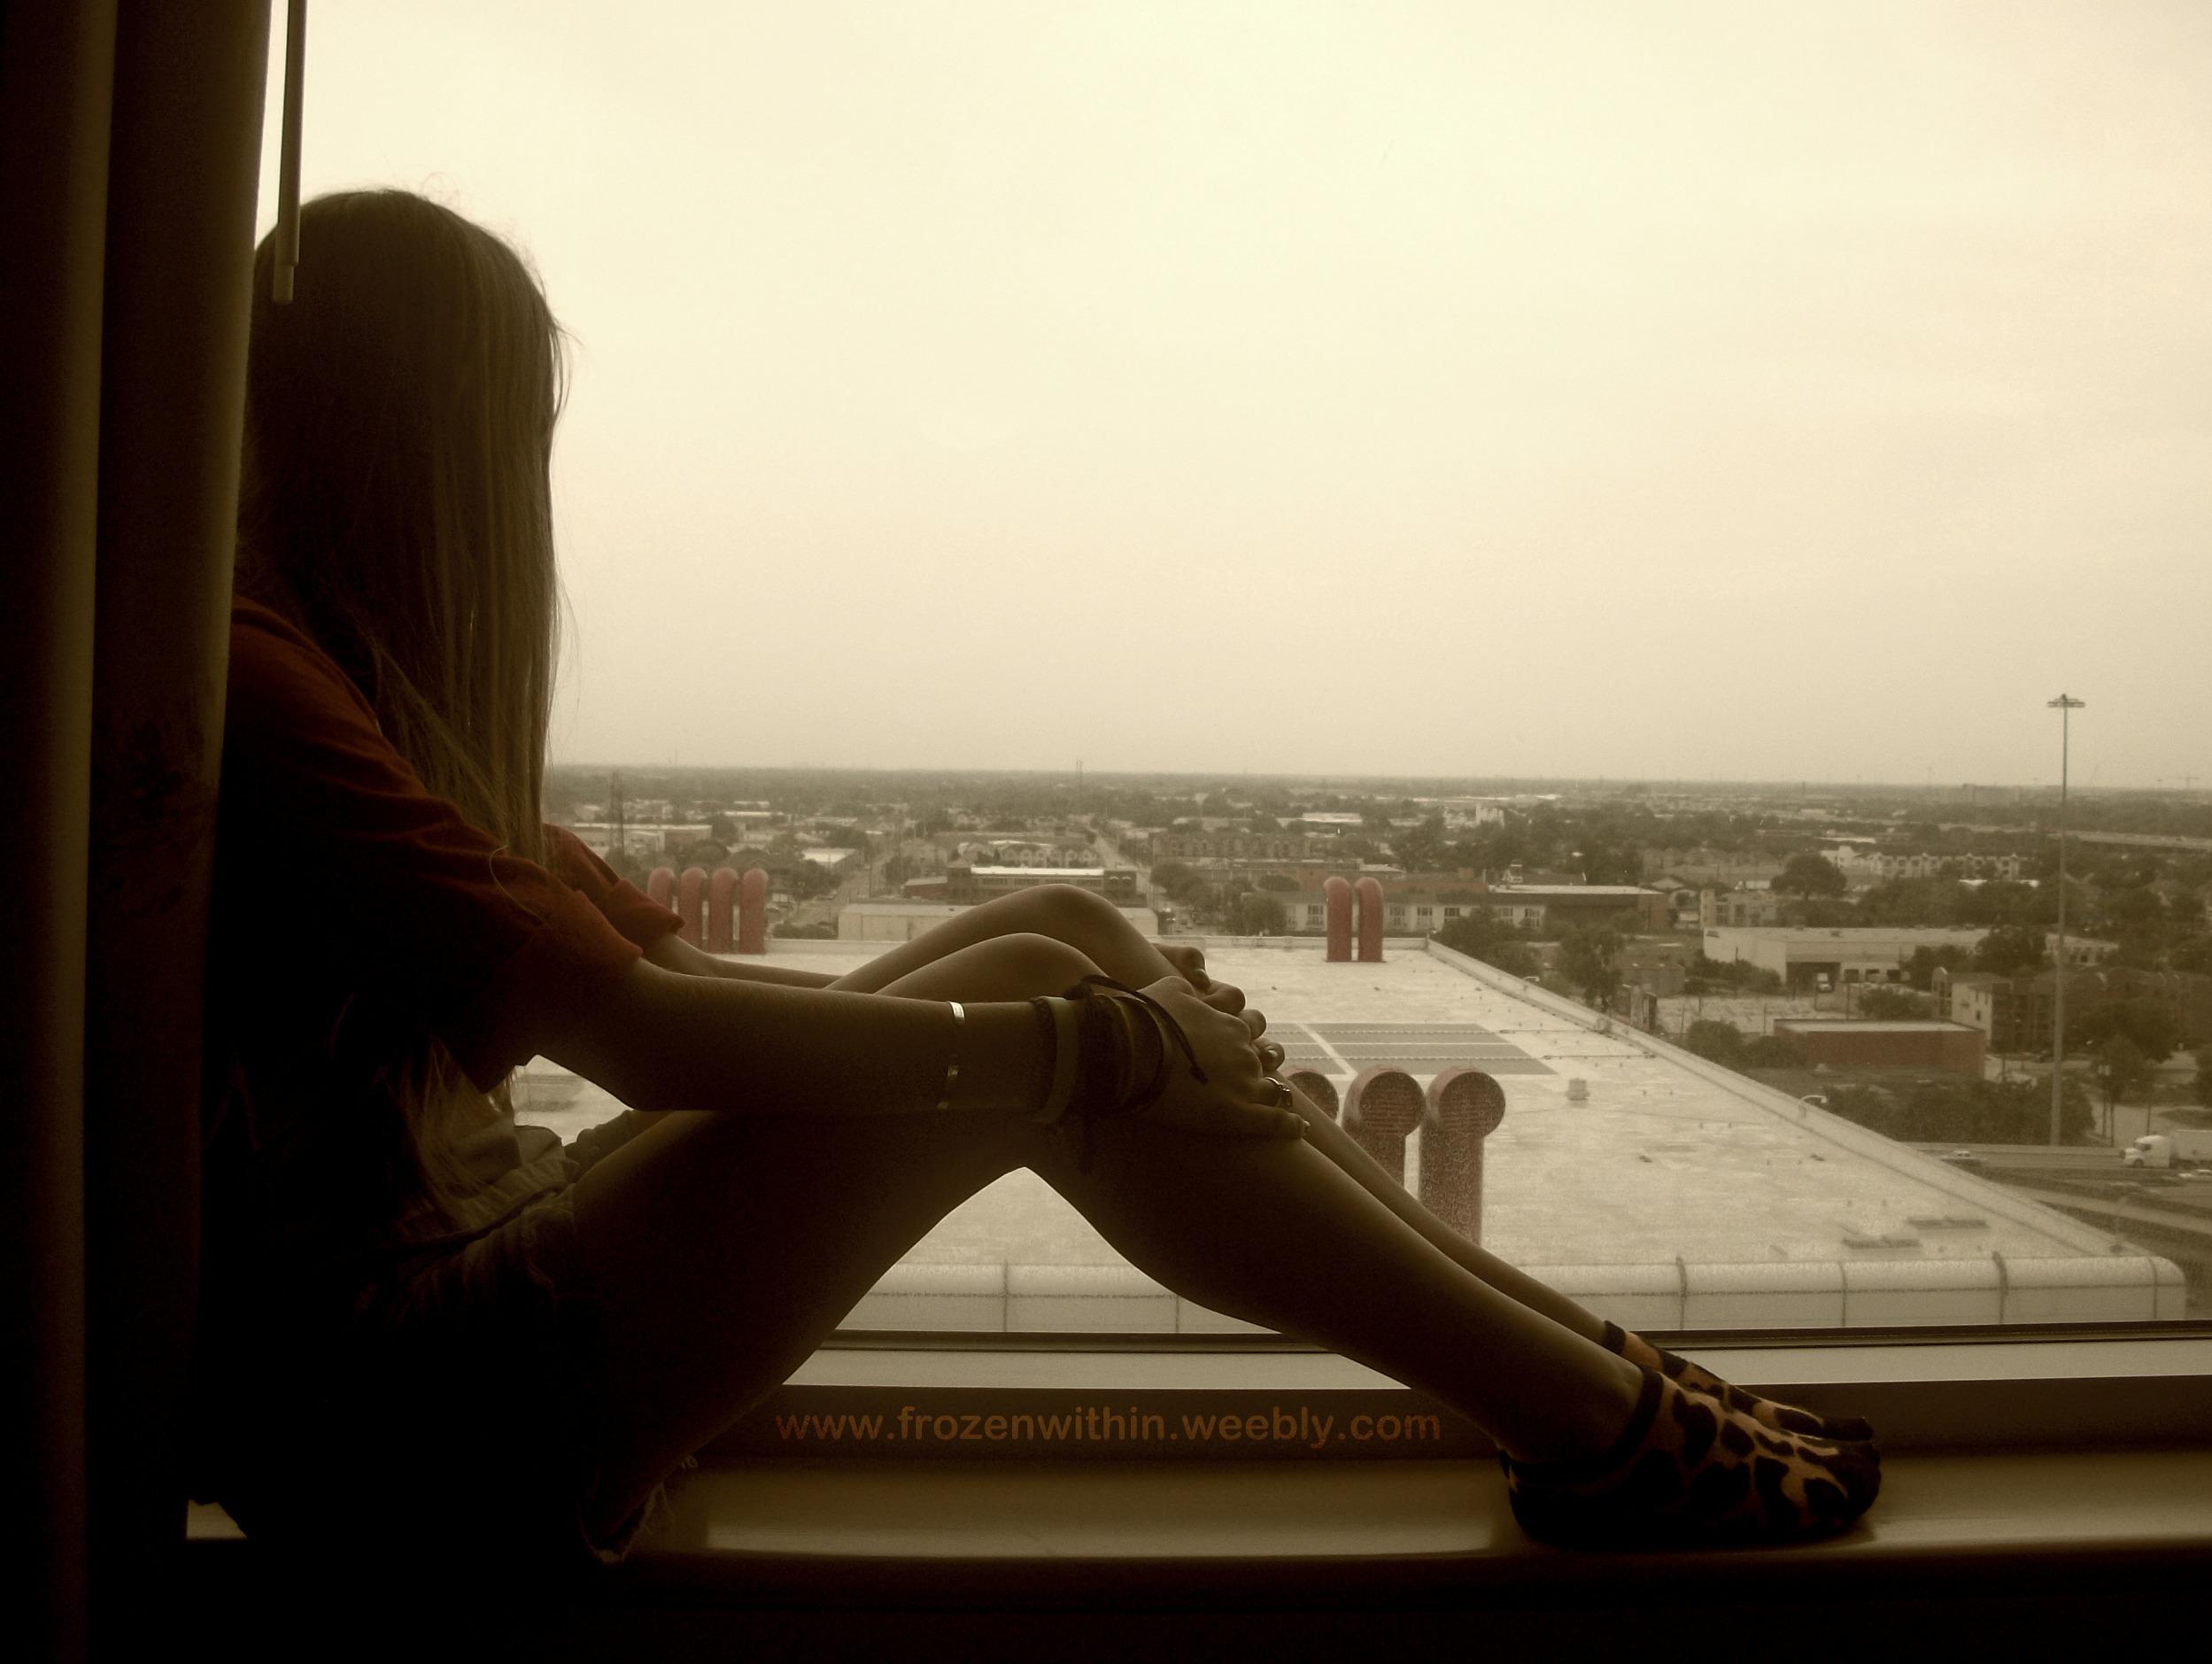 Sit In Window between birds of prey #190 - a window to the world